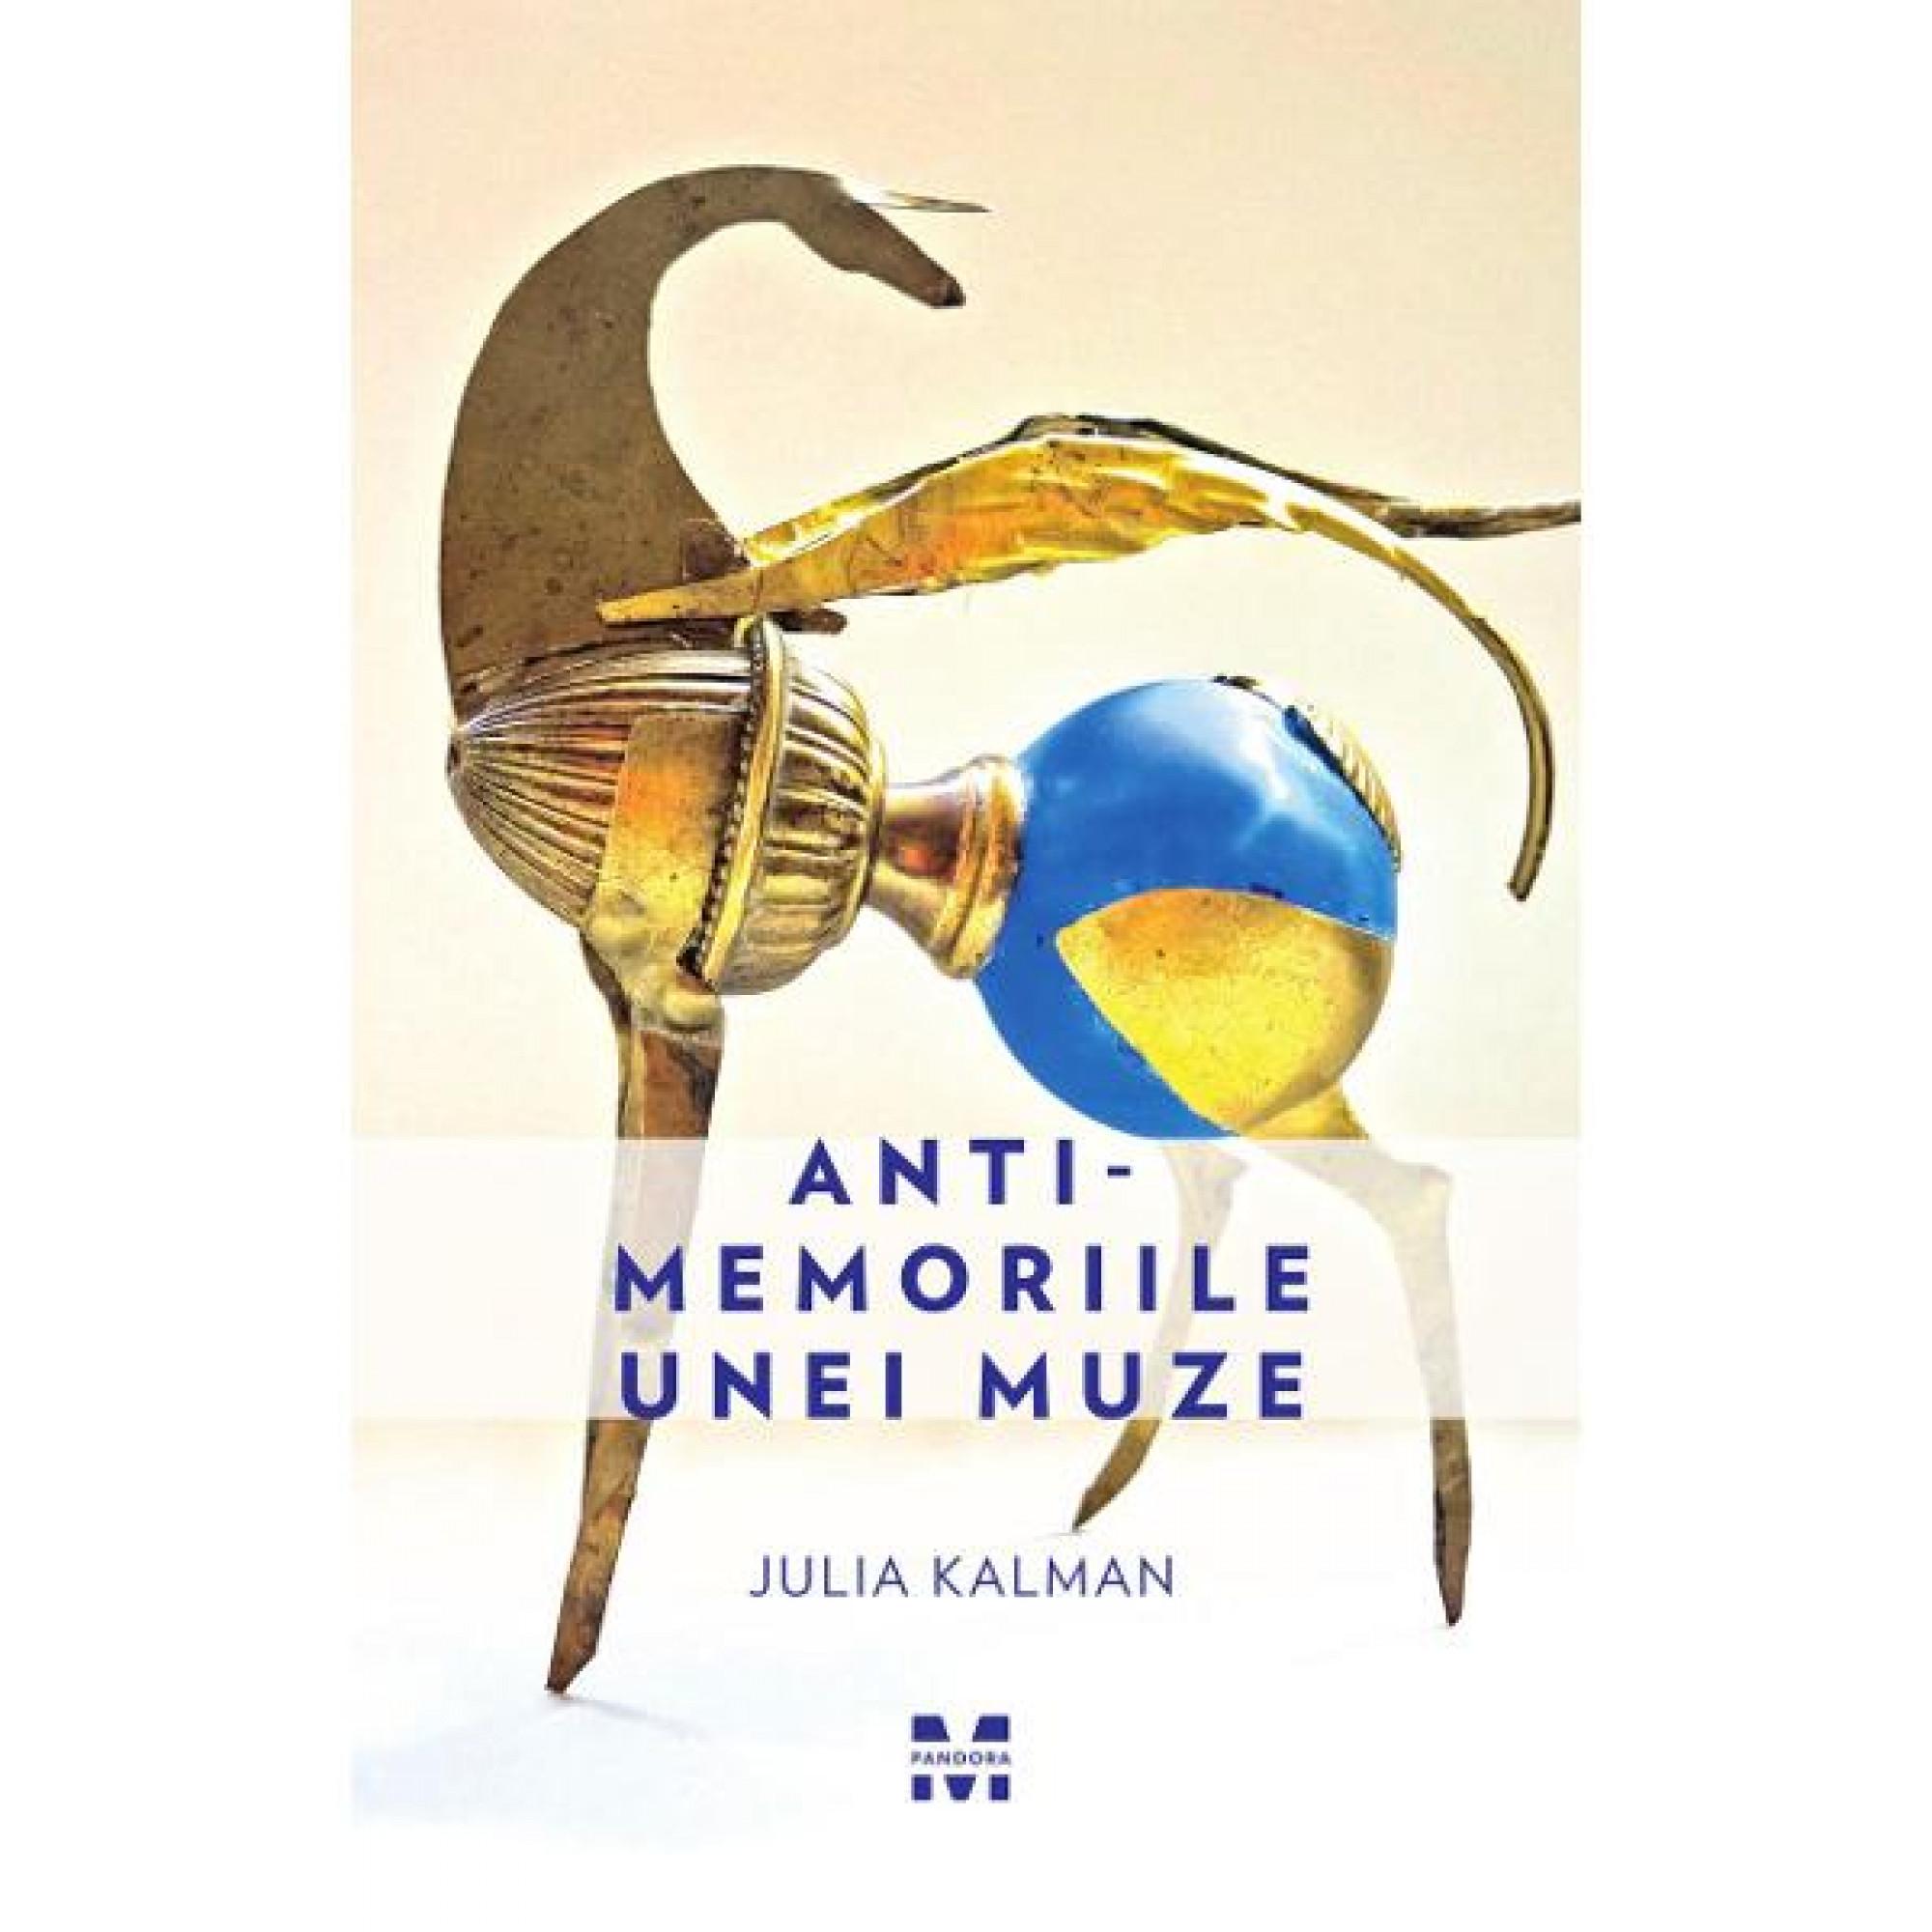 Anti-memoriile unei muze